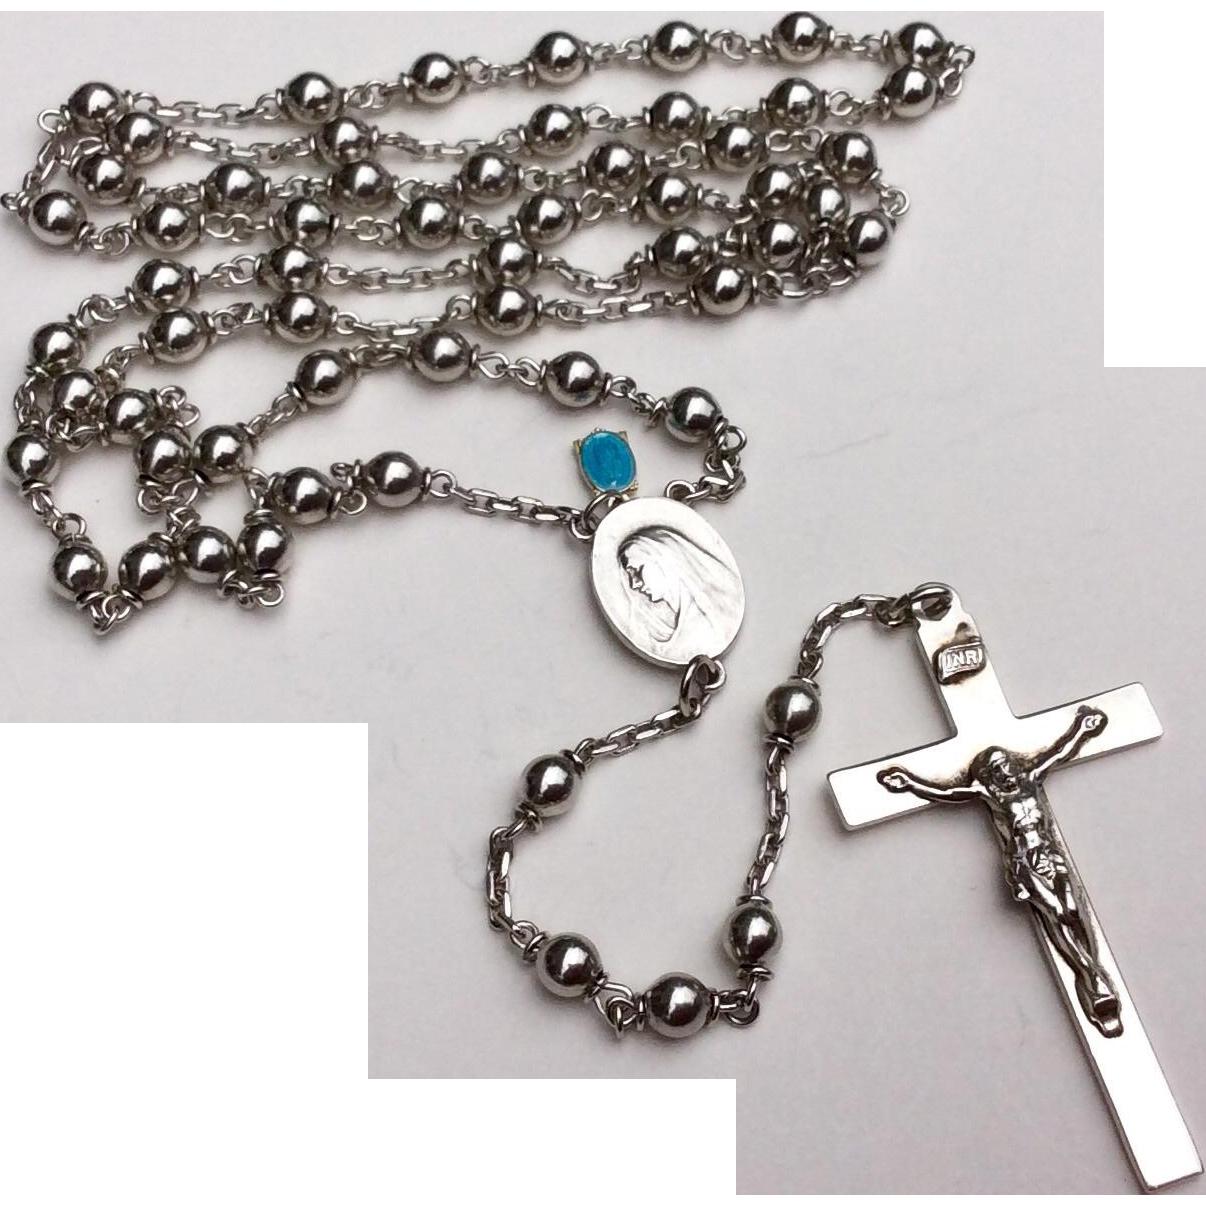 Vintage Sterling Silver Catholic Religion Rosary